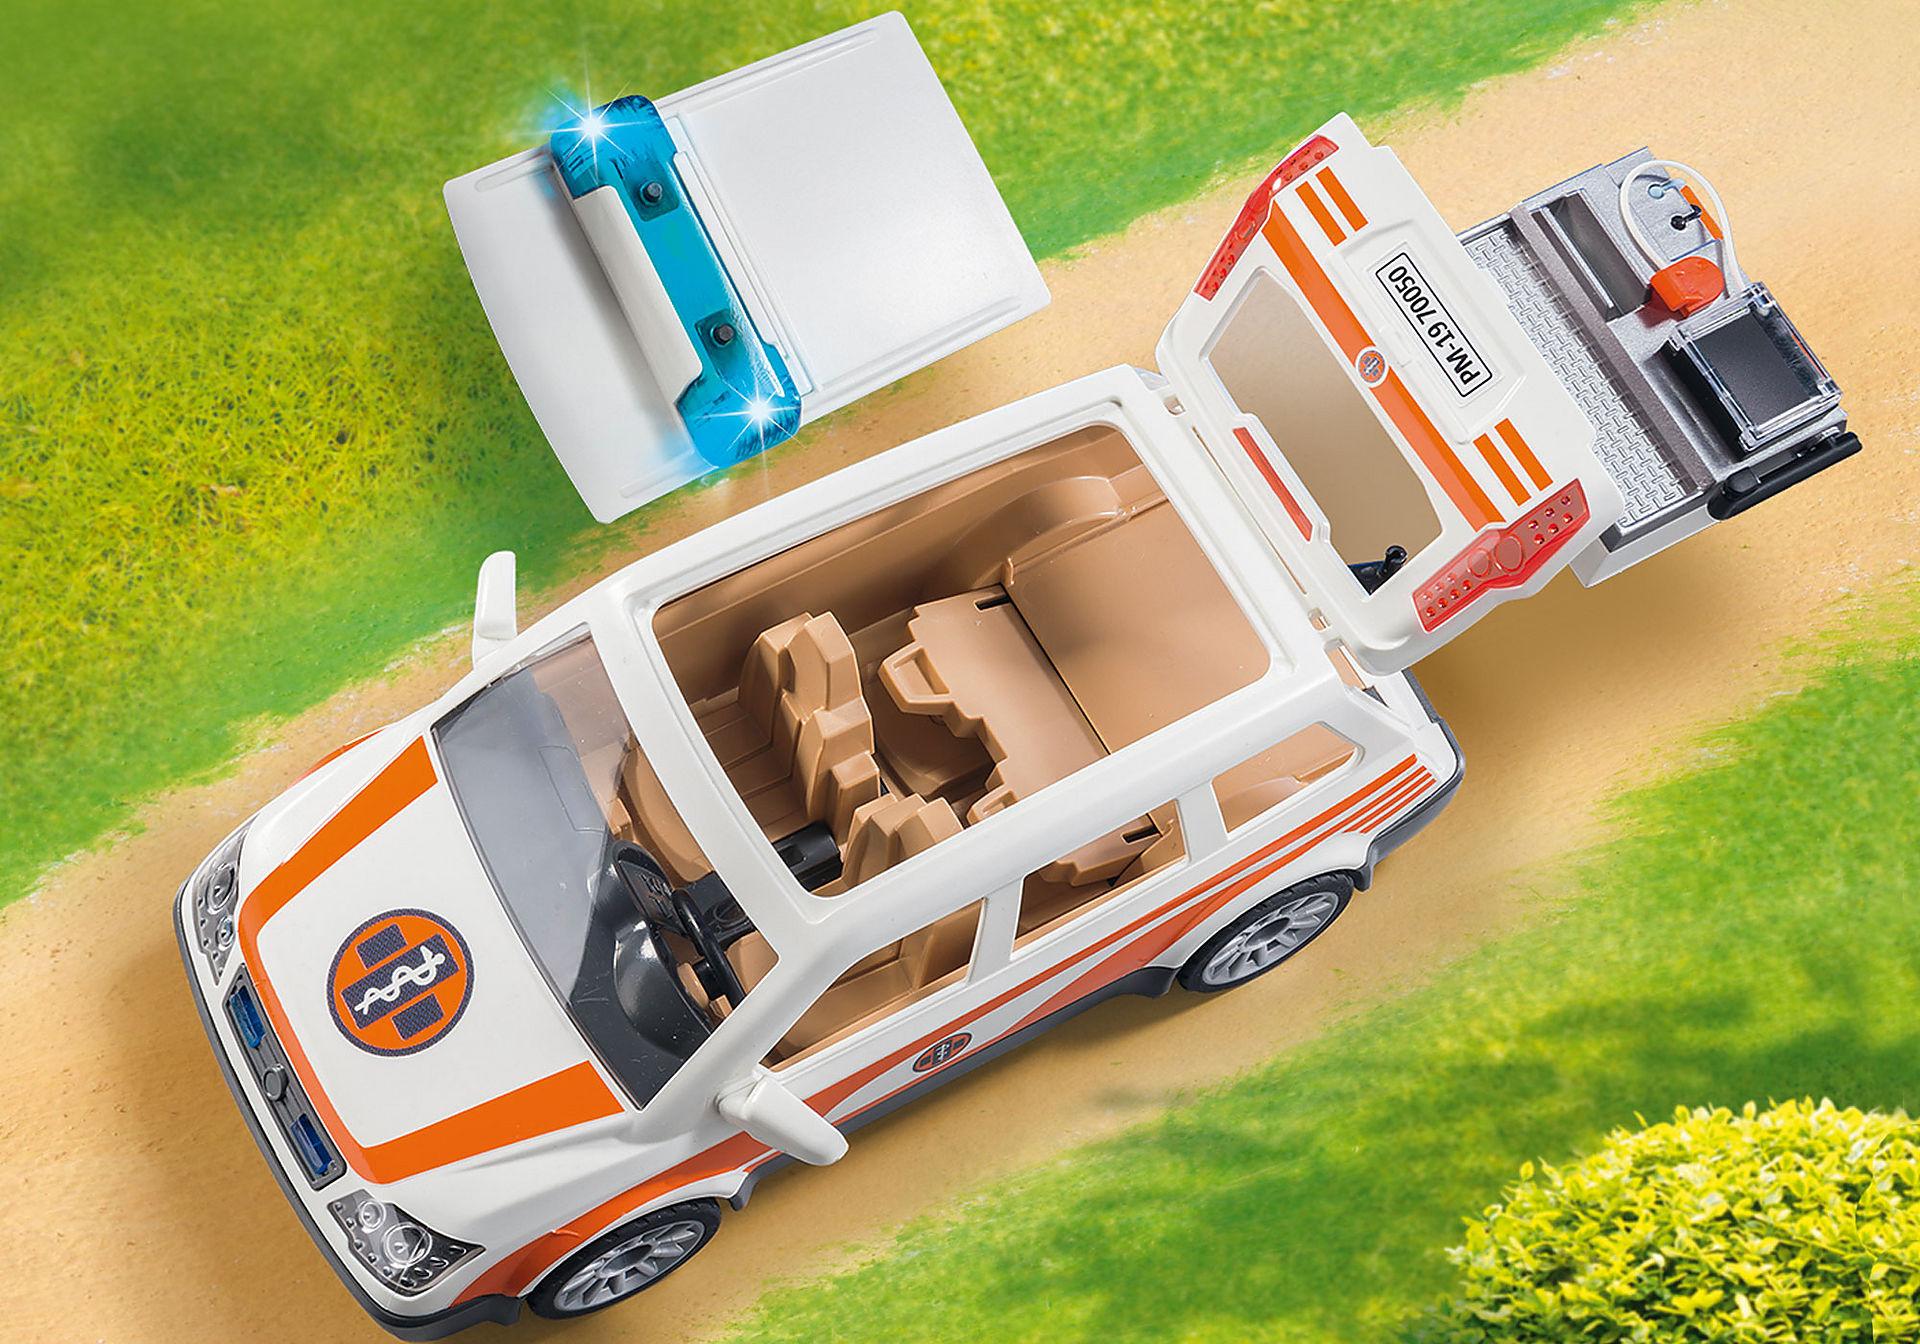 http://media.playmobil.com/i/playmobil/70050_product_extra2/Redningsbil med sirene